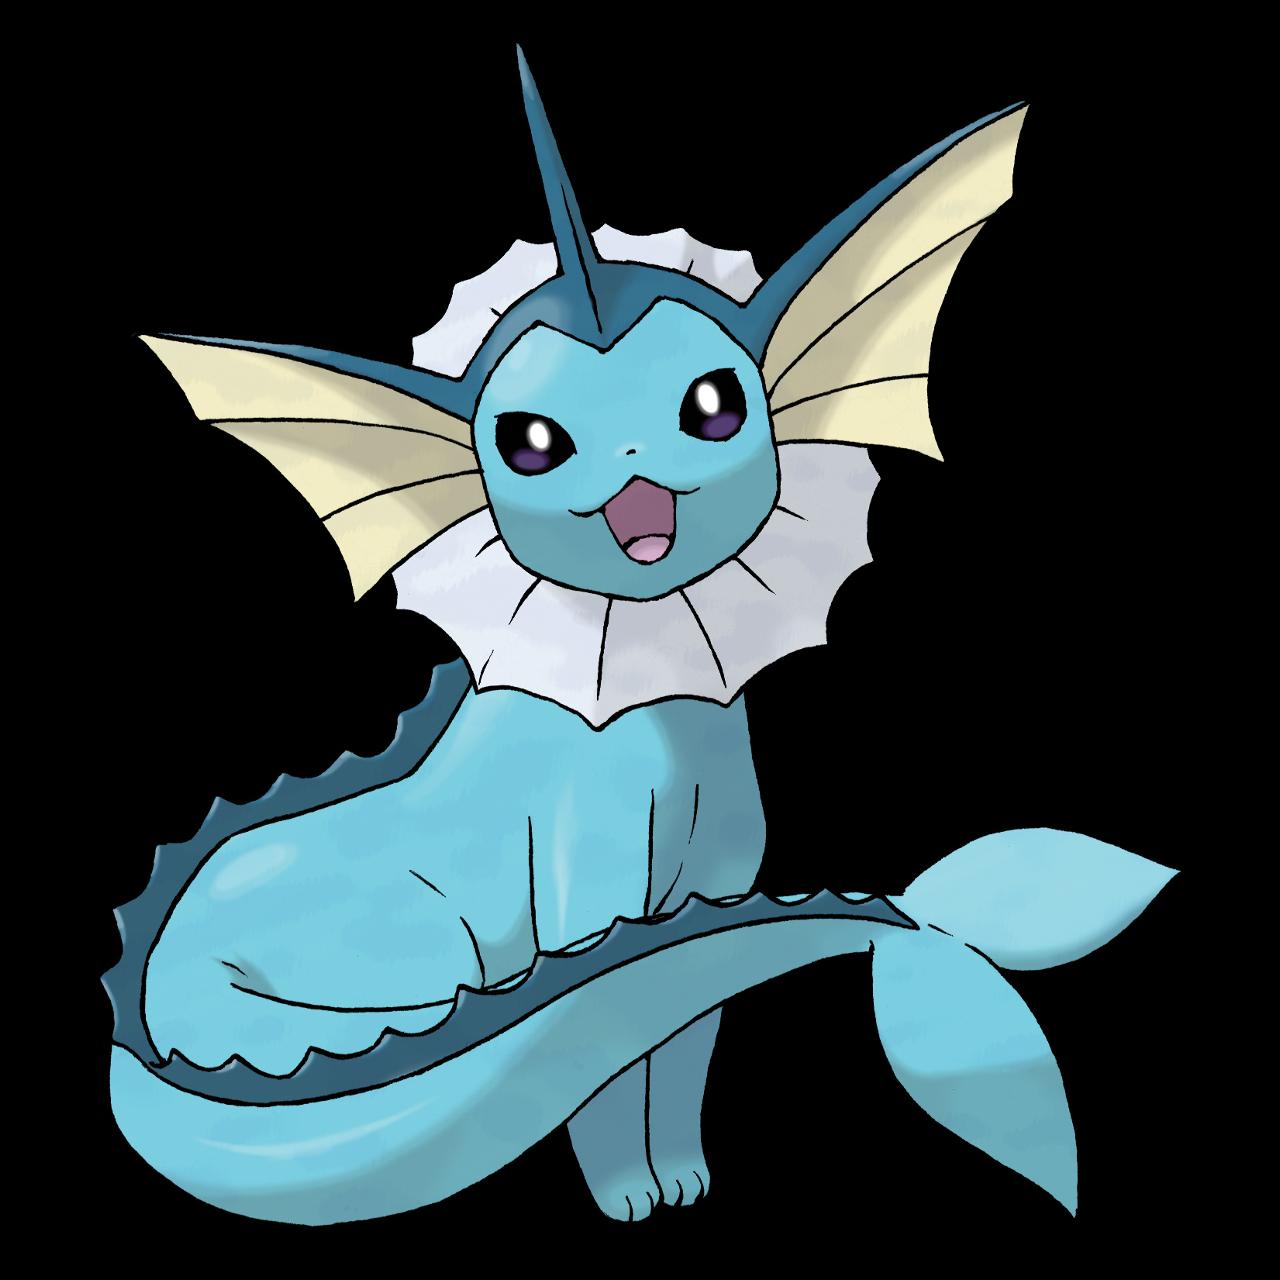 Pokemon clipart umbreon. Eevee pok mon opal